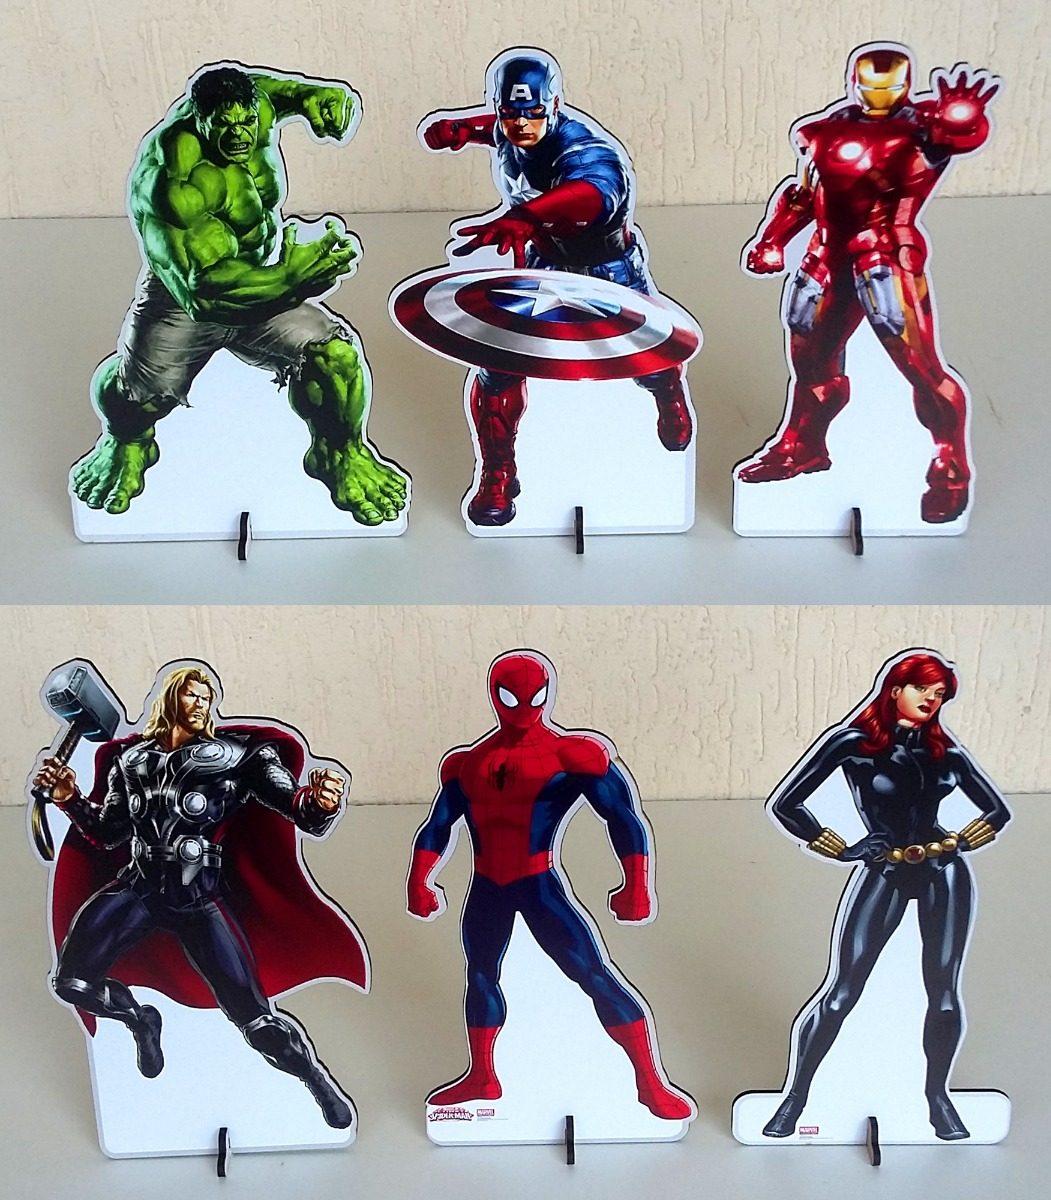 f1f00d1f0 kit 12 vingadores mesa hulk, cap américa, homem de ferro mdf. Carregando  zoom.